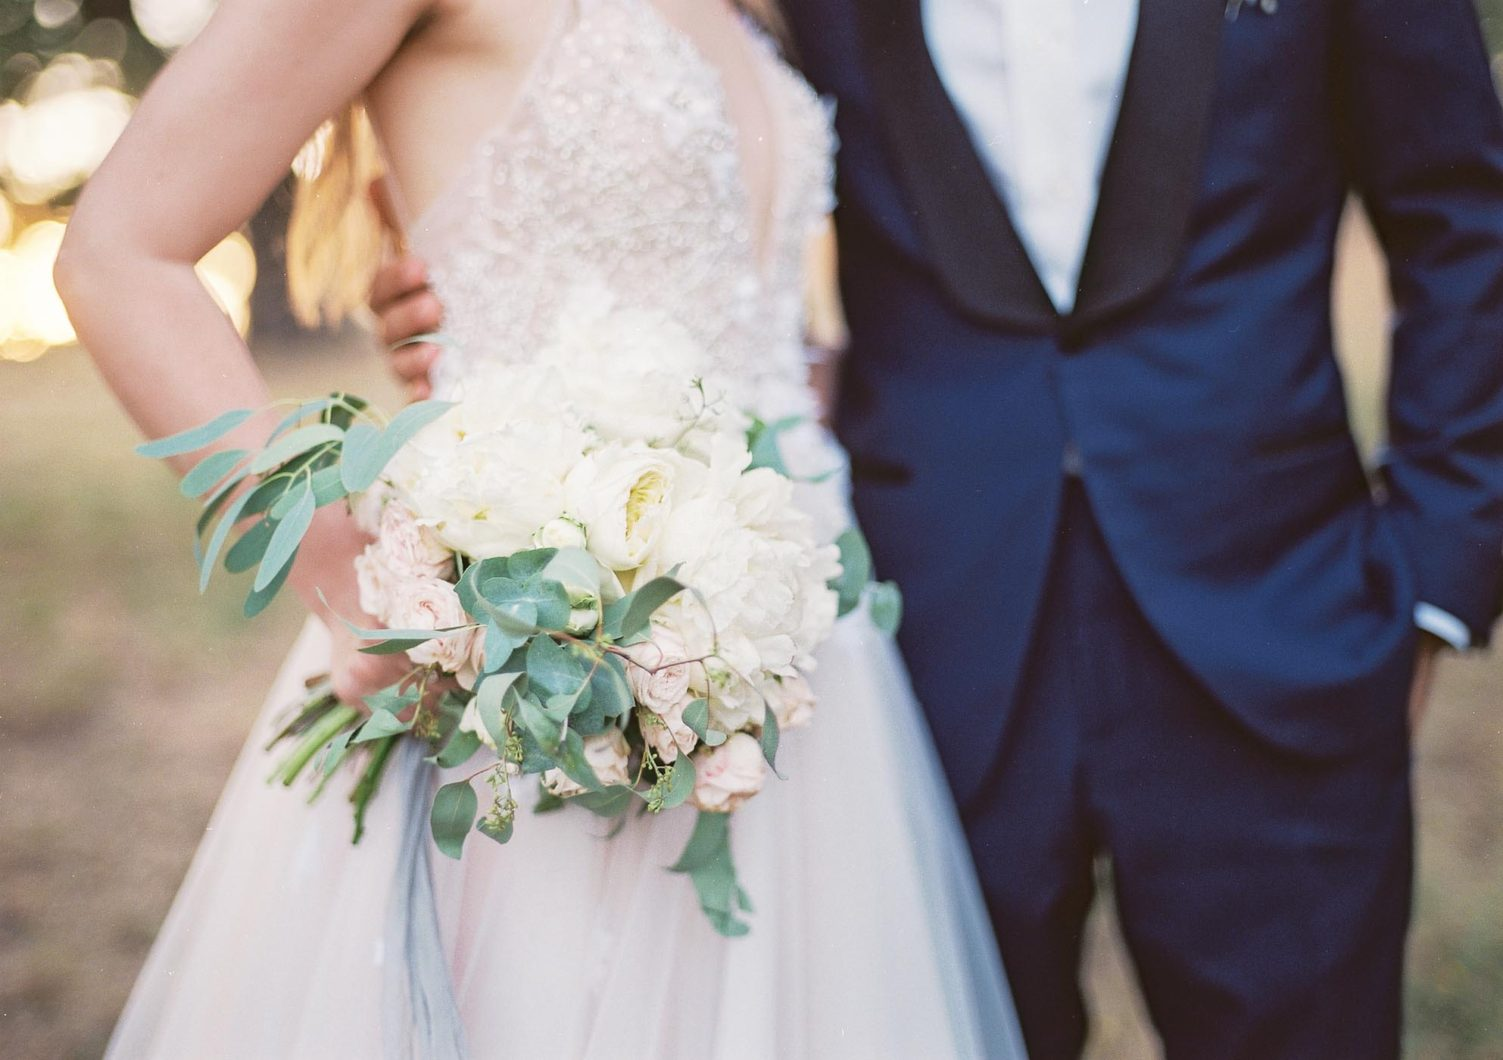 wedding_photographer_tuscany_italy_conti_di_san_bonifacio_3